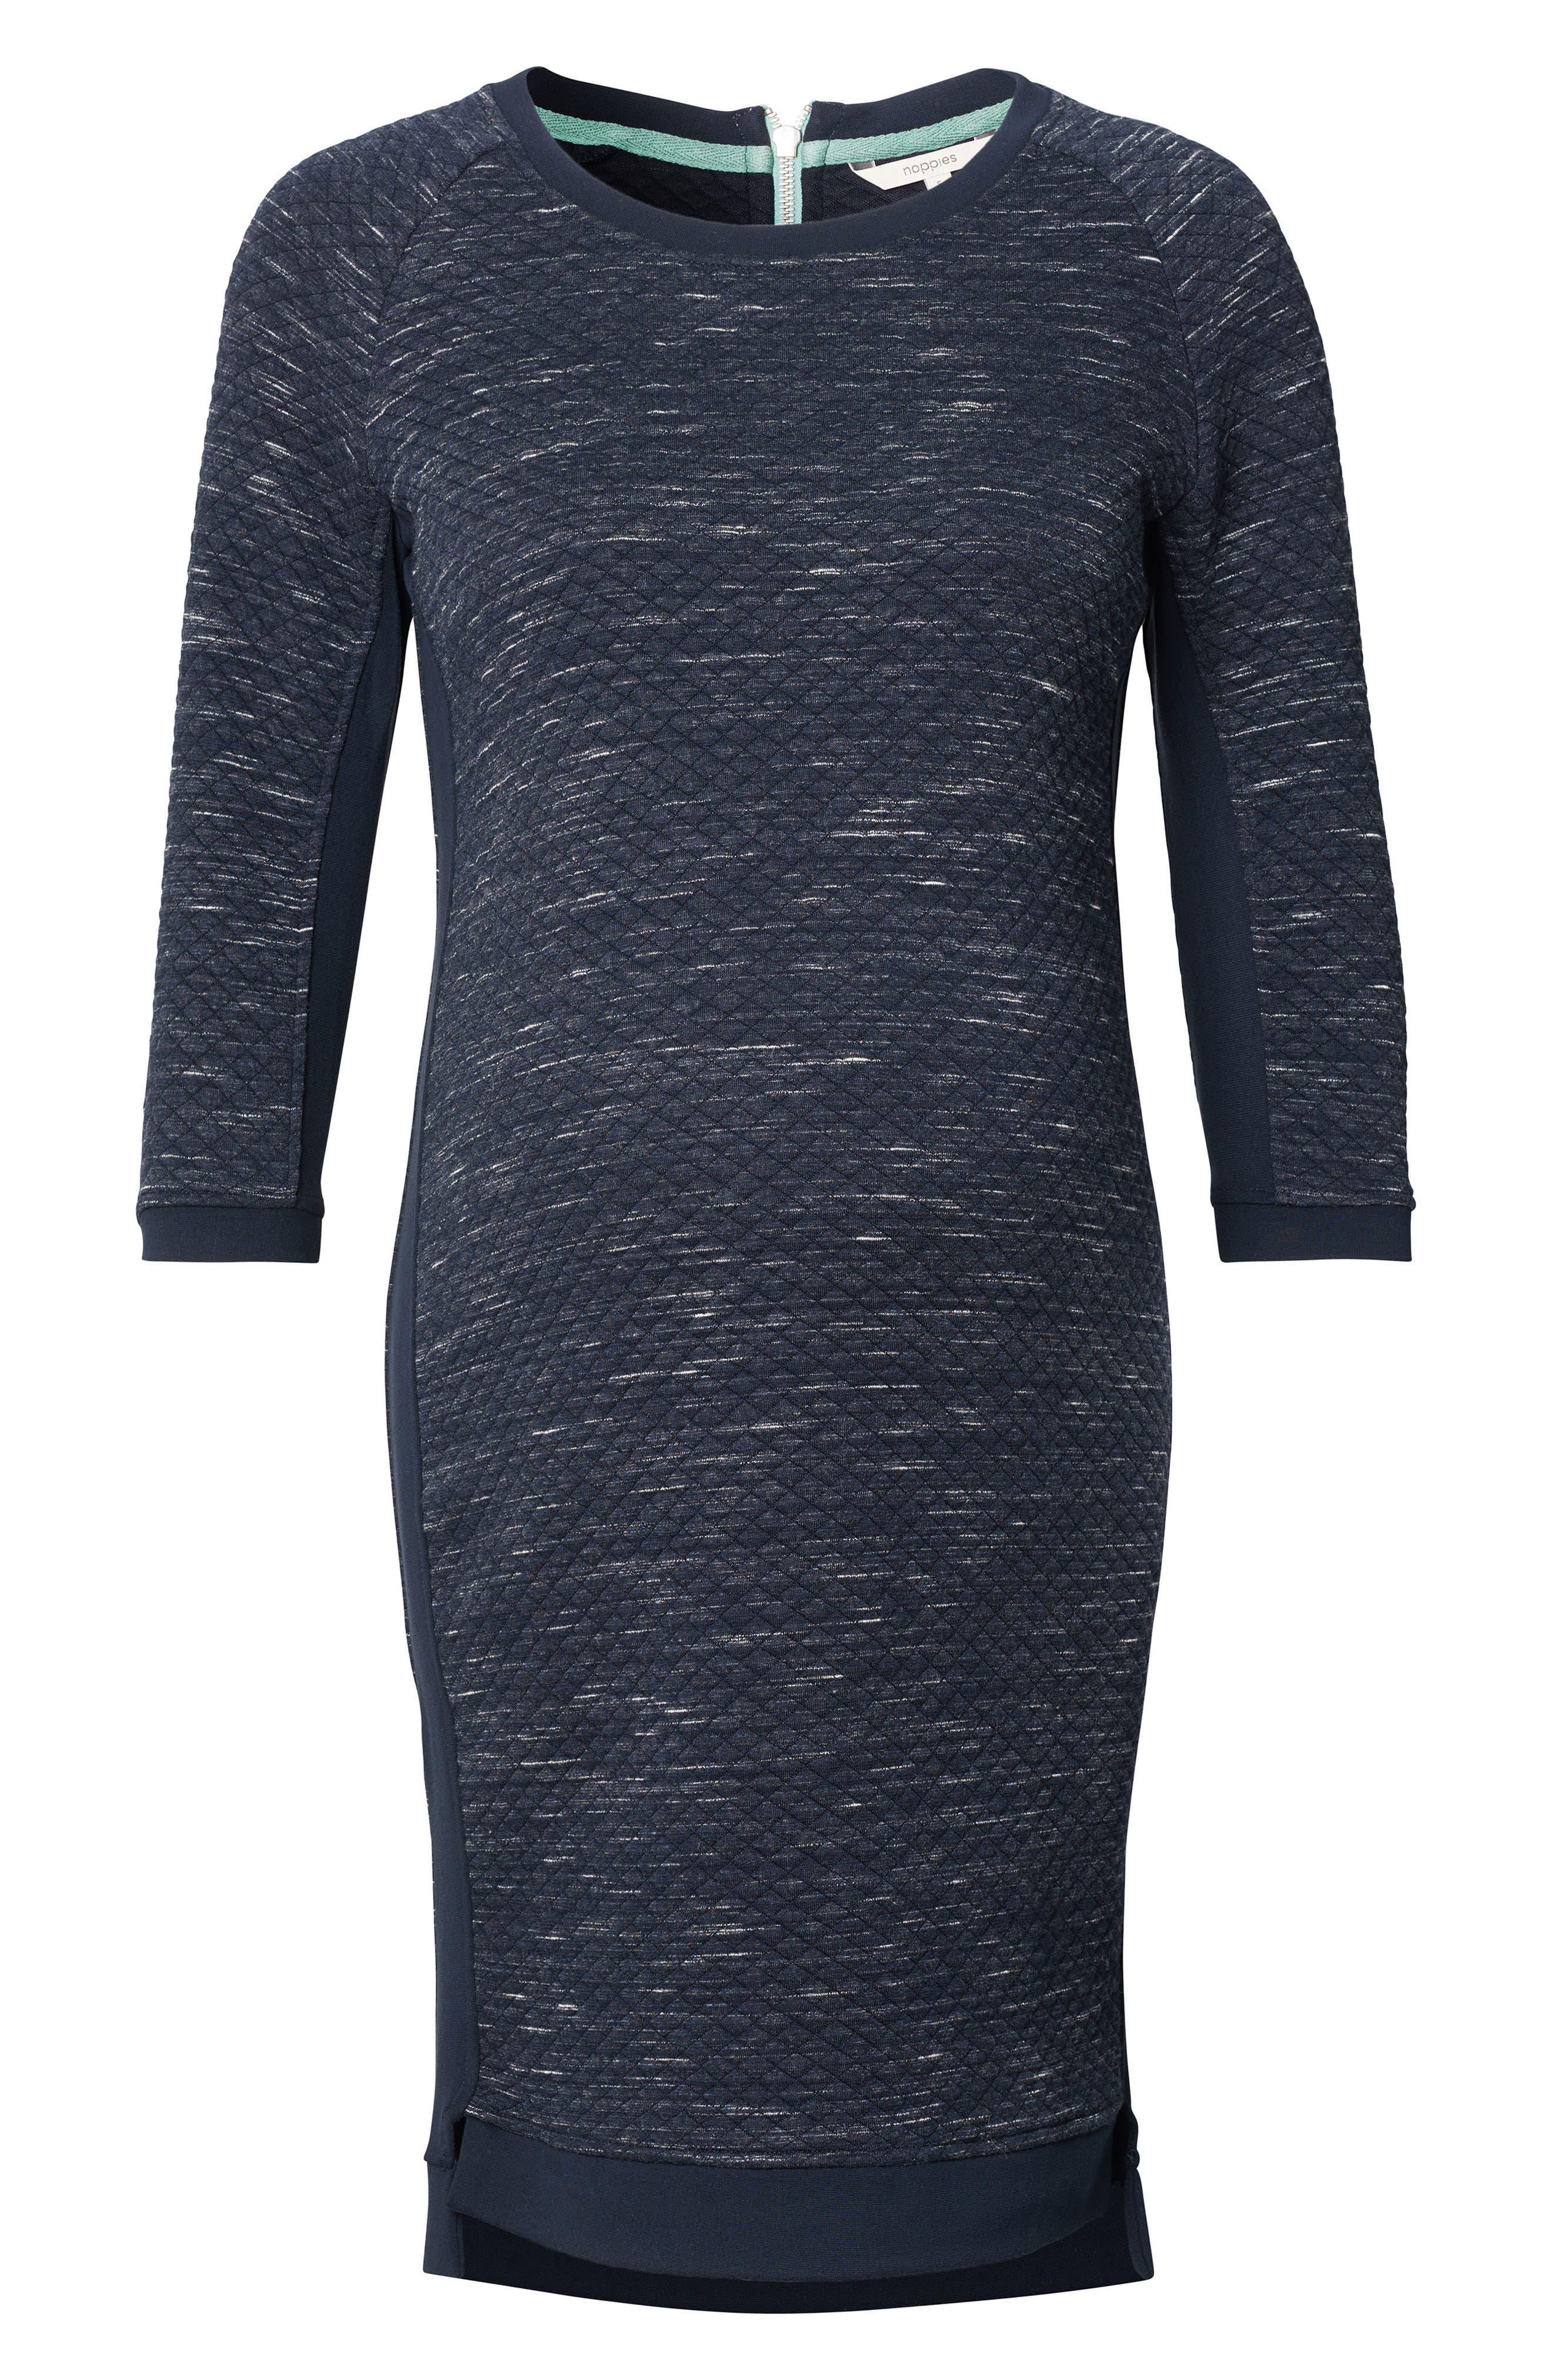 Noppies Gemma Maternity Sweater Dress